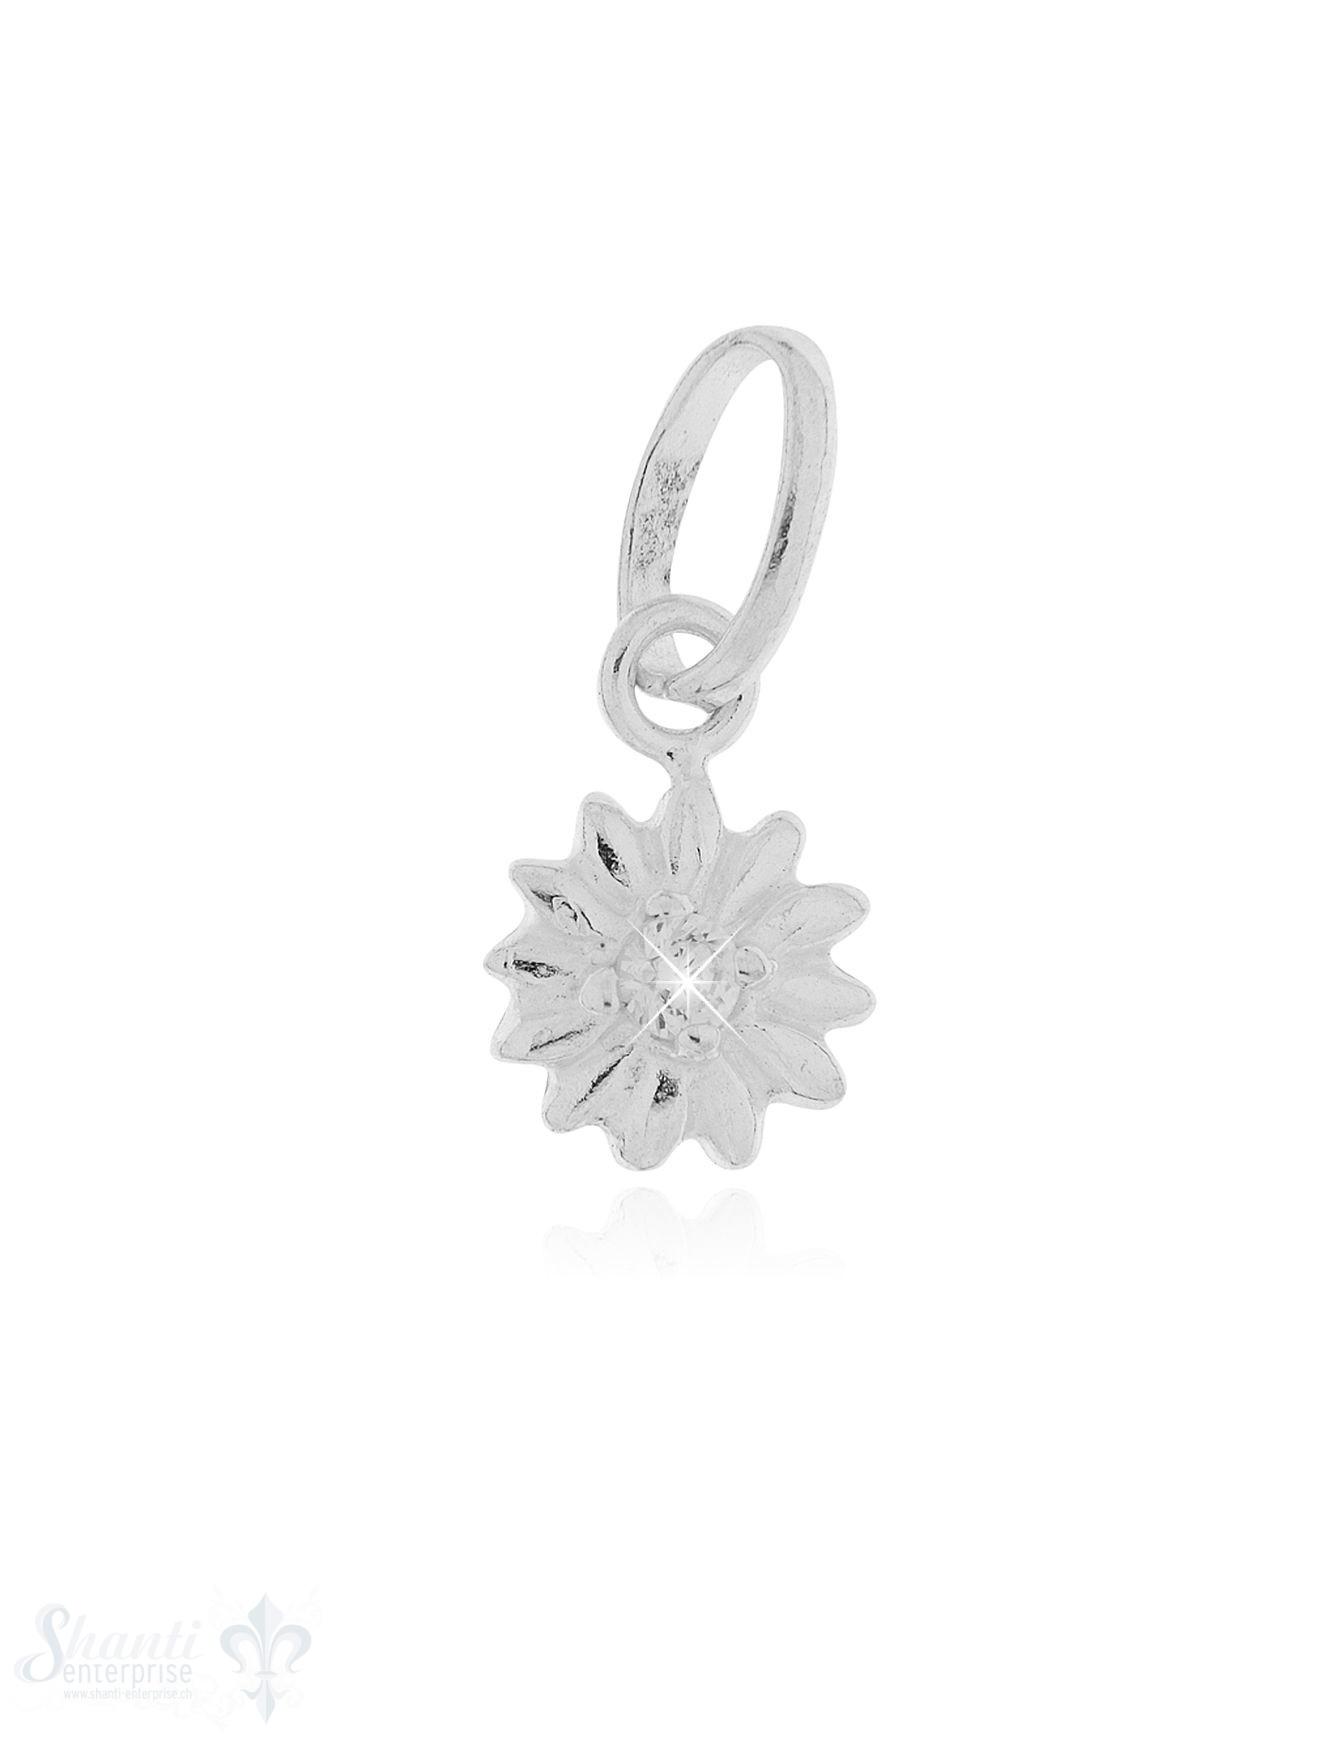 Anhänger Silber hell Blume mit Zirkaonia 7 mm Öse